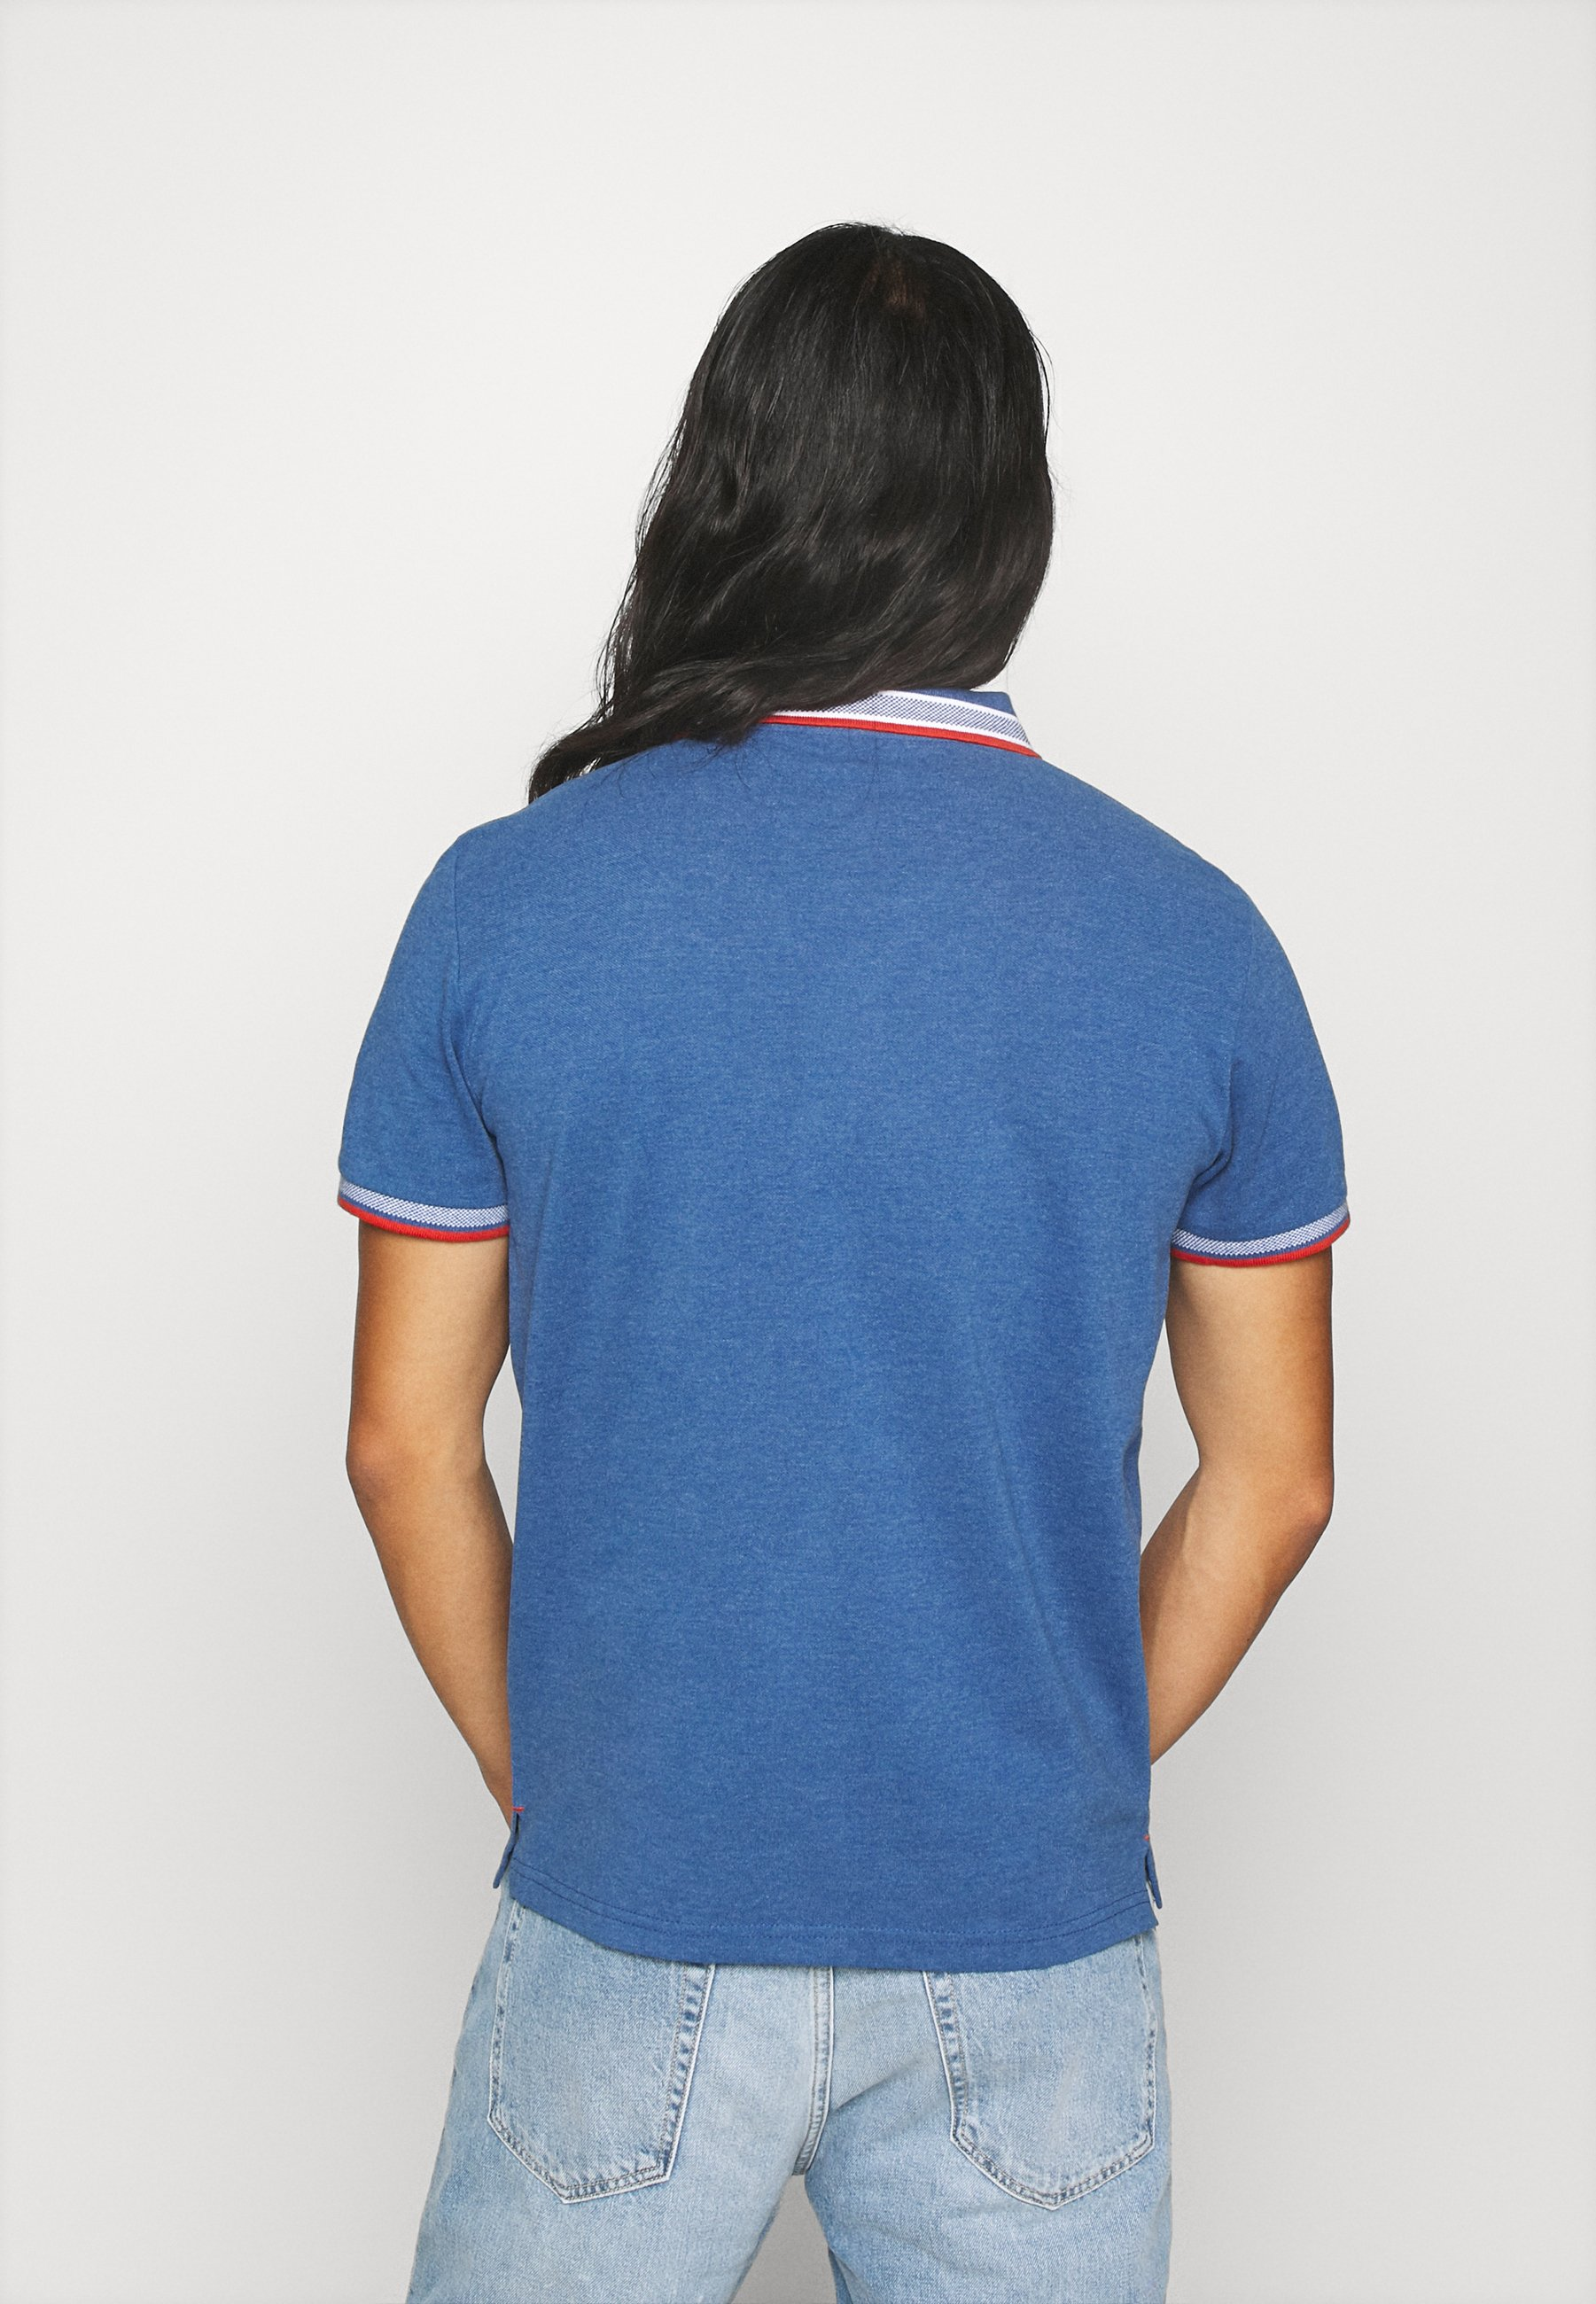 TOM TAILOR WORDING TIPPING - Polo shirt - estate blue white melange Ey3nV